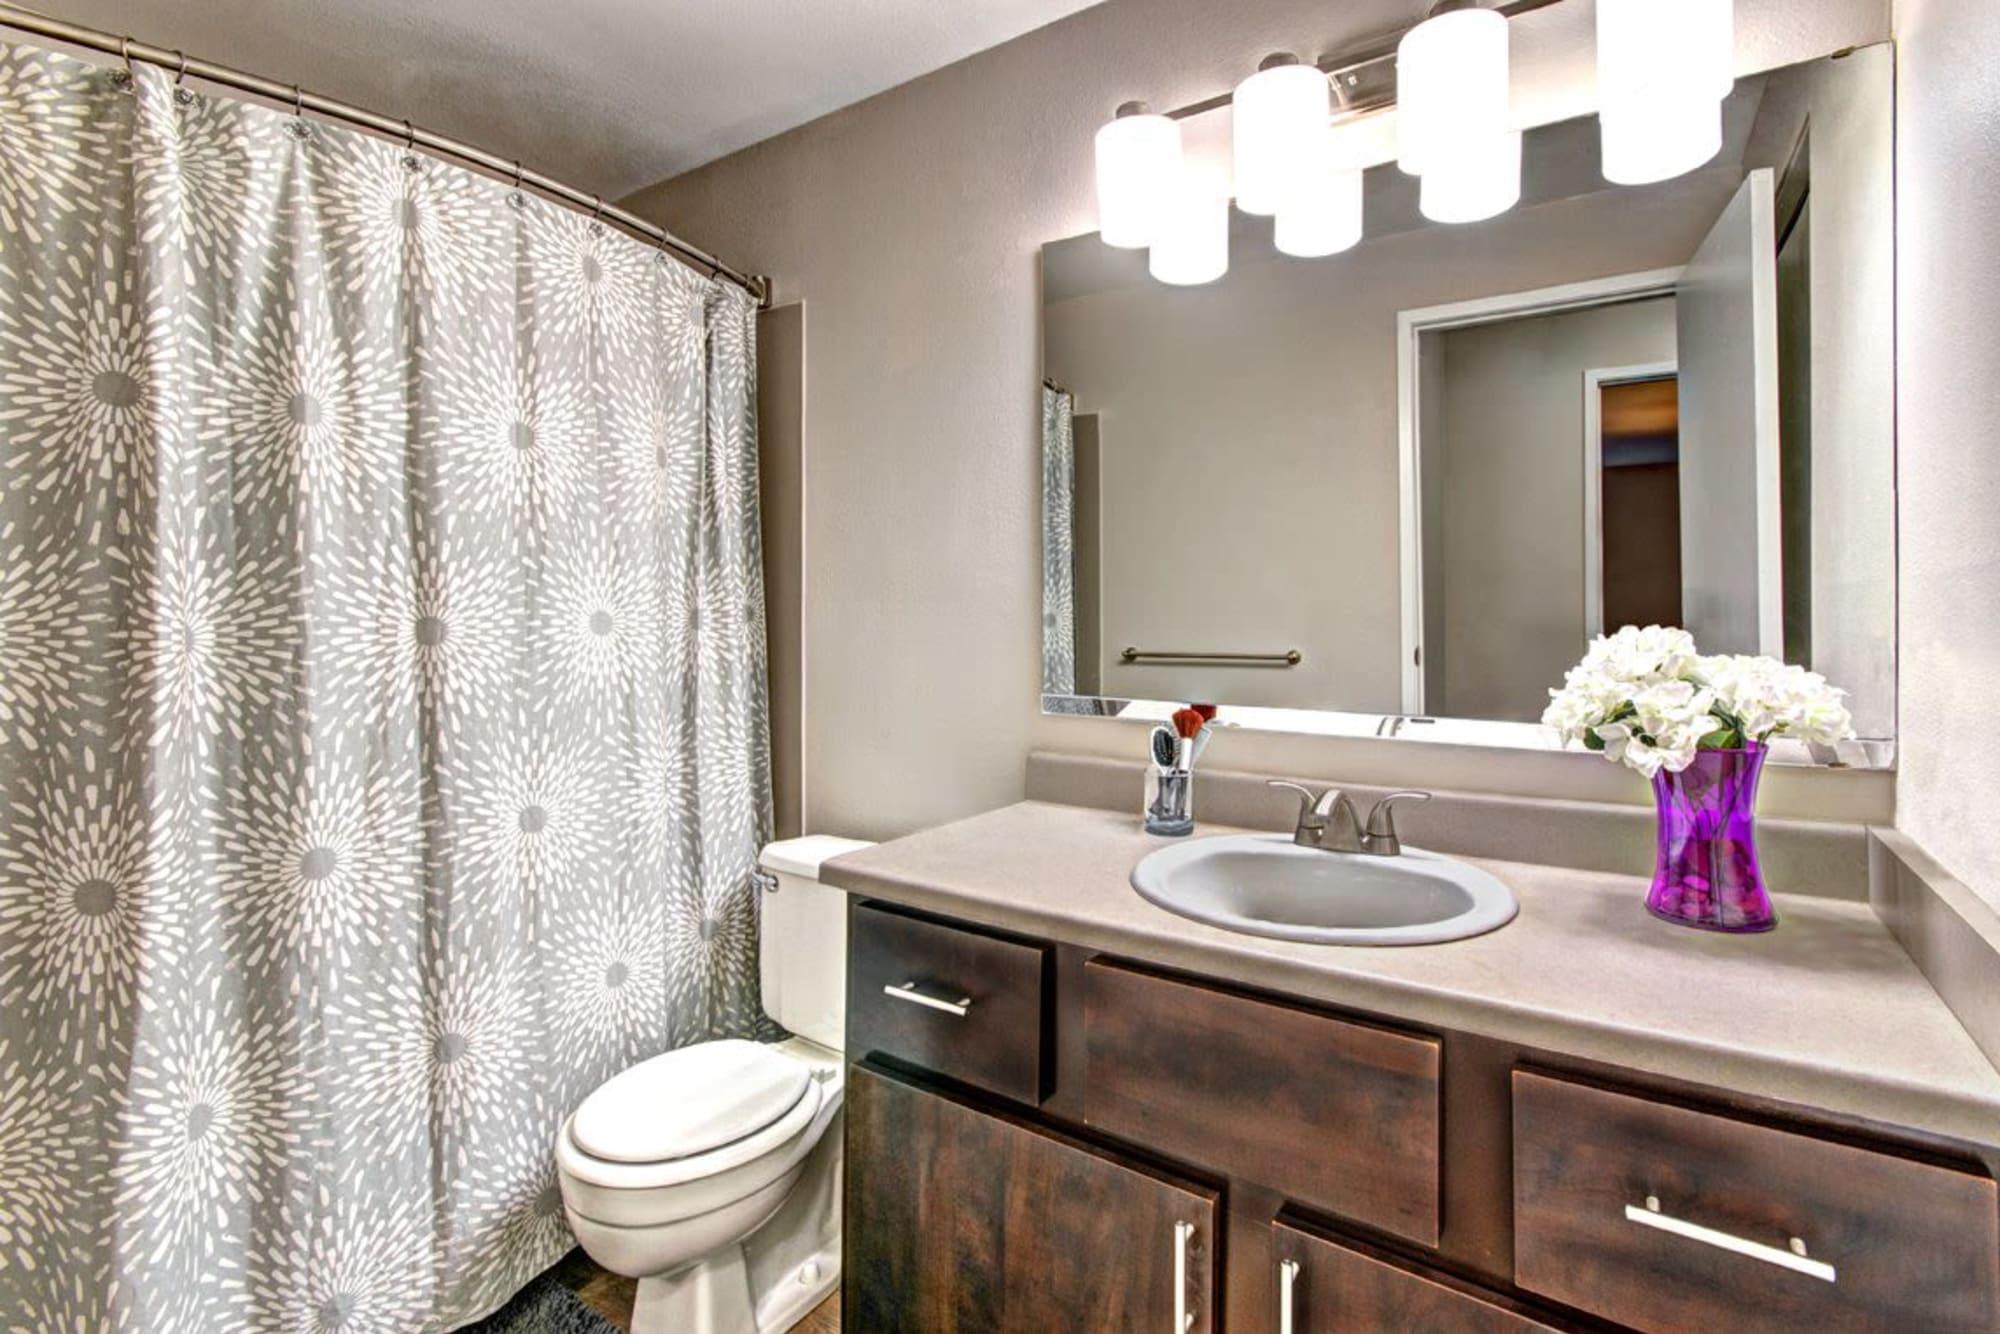 A stylishly modern bathroom at Wellington Apartment Homes in Silverdale, Washington